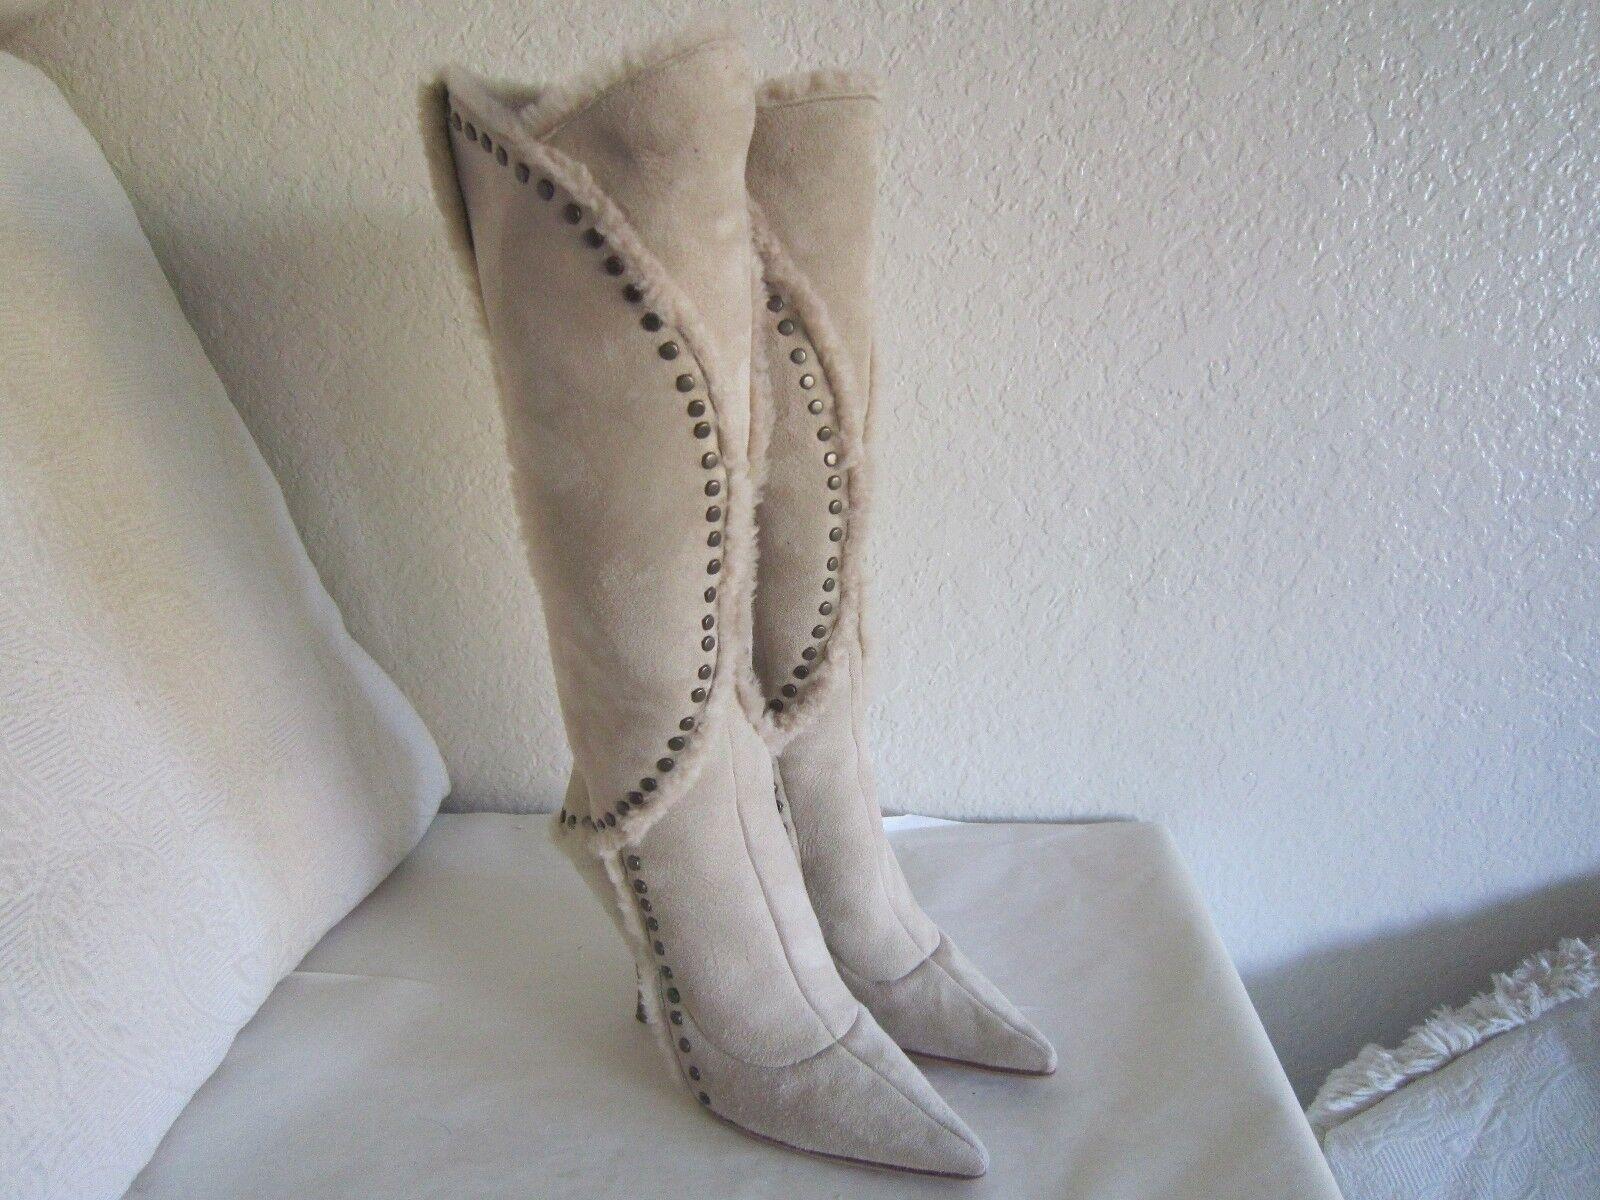 Jimmy Choo Beige Suede Shearling Studded High Heel Knee Stiefel Sz 37.5 Us 7